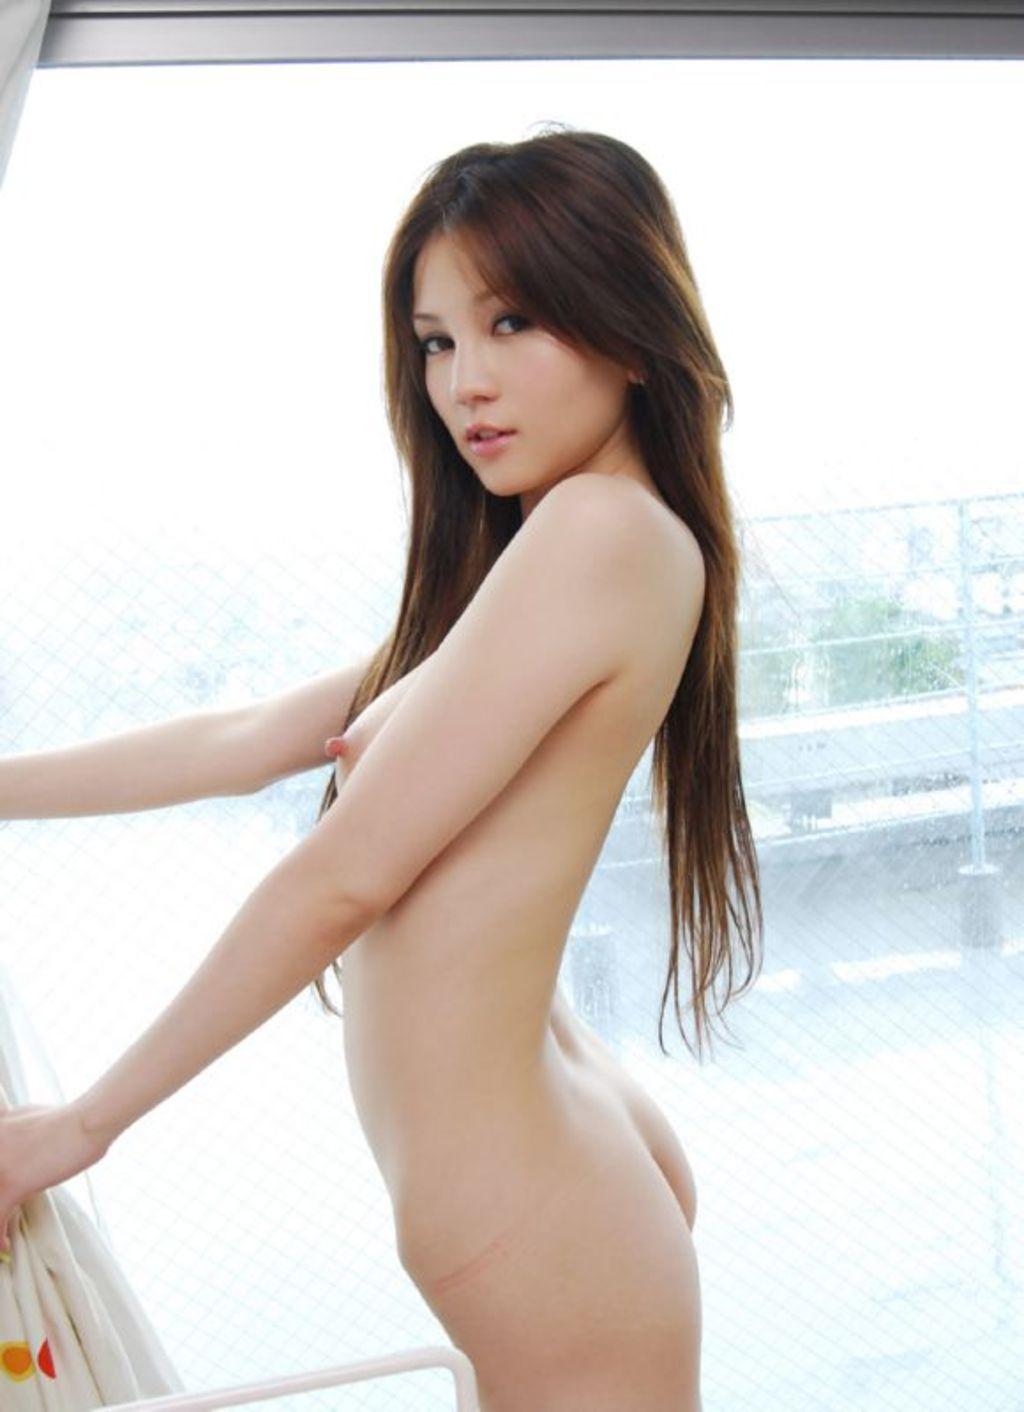 Ameri ichinose nude